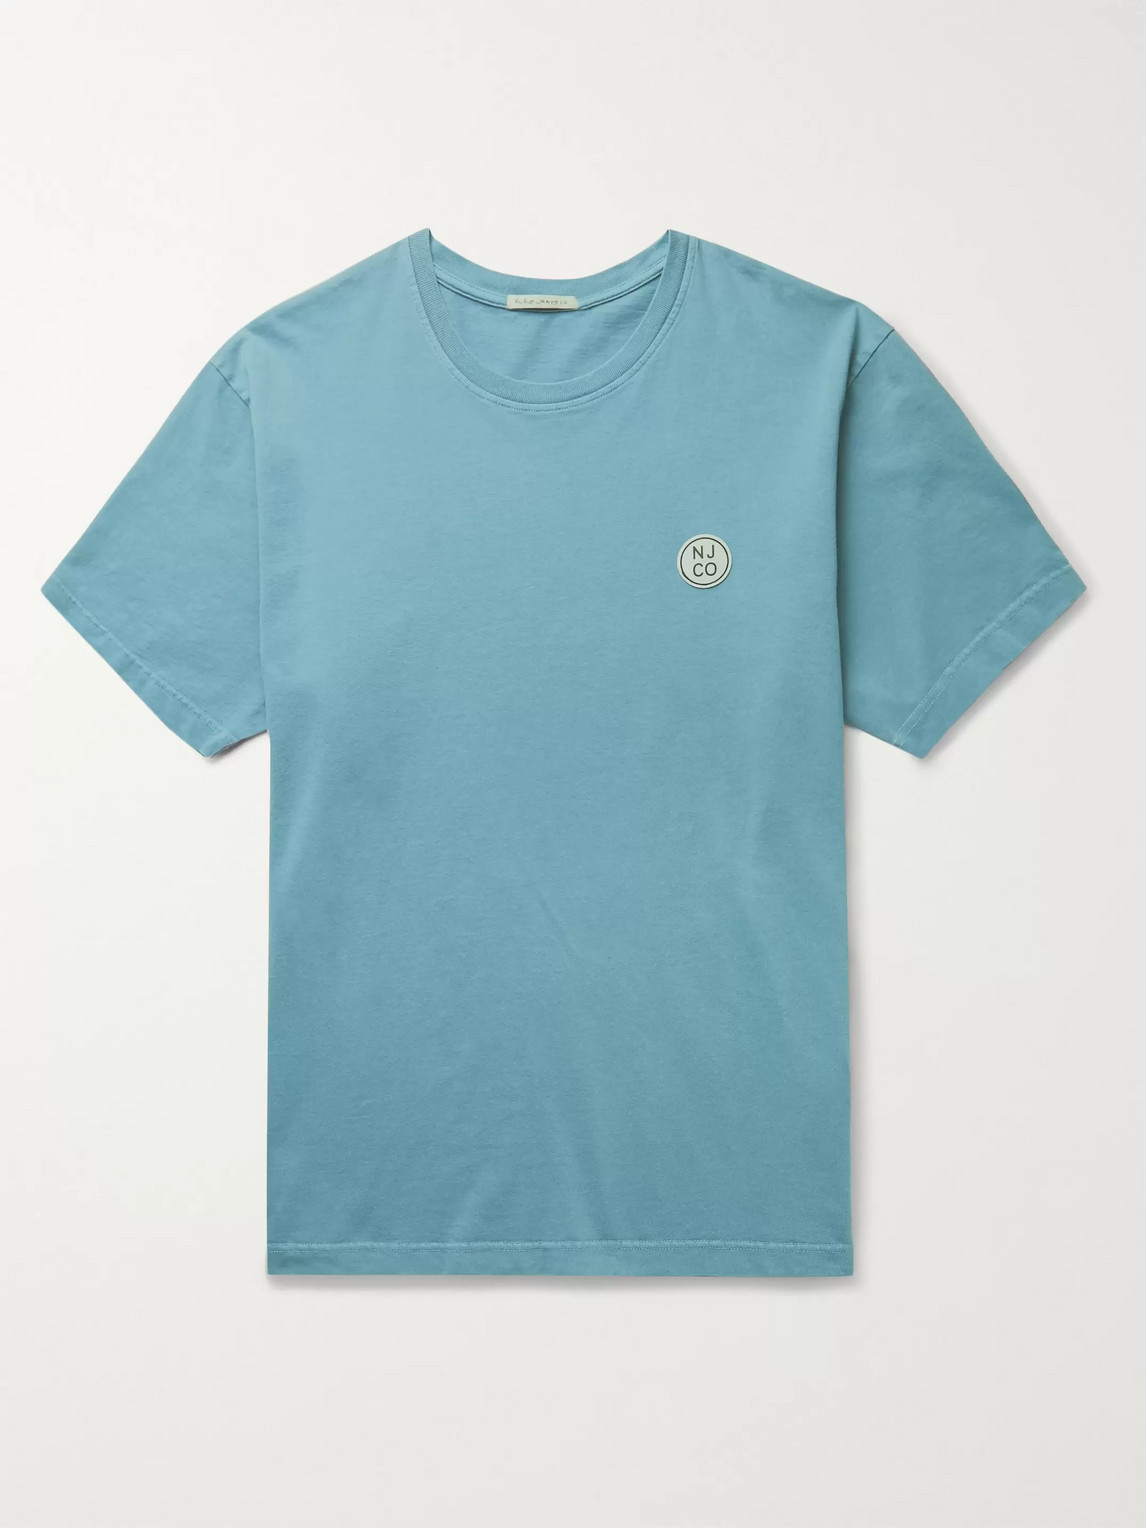 nudie jeans - uno logo-appliquéd organic cotton-jersey t-shirt - men - blue